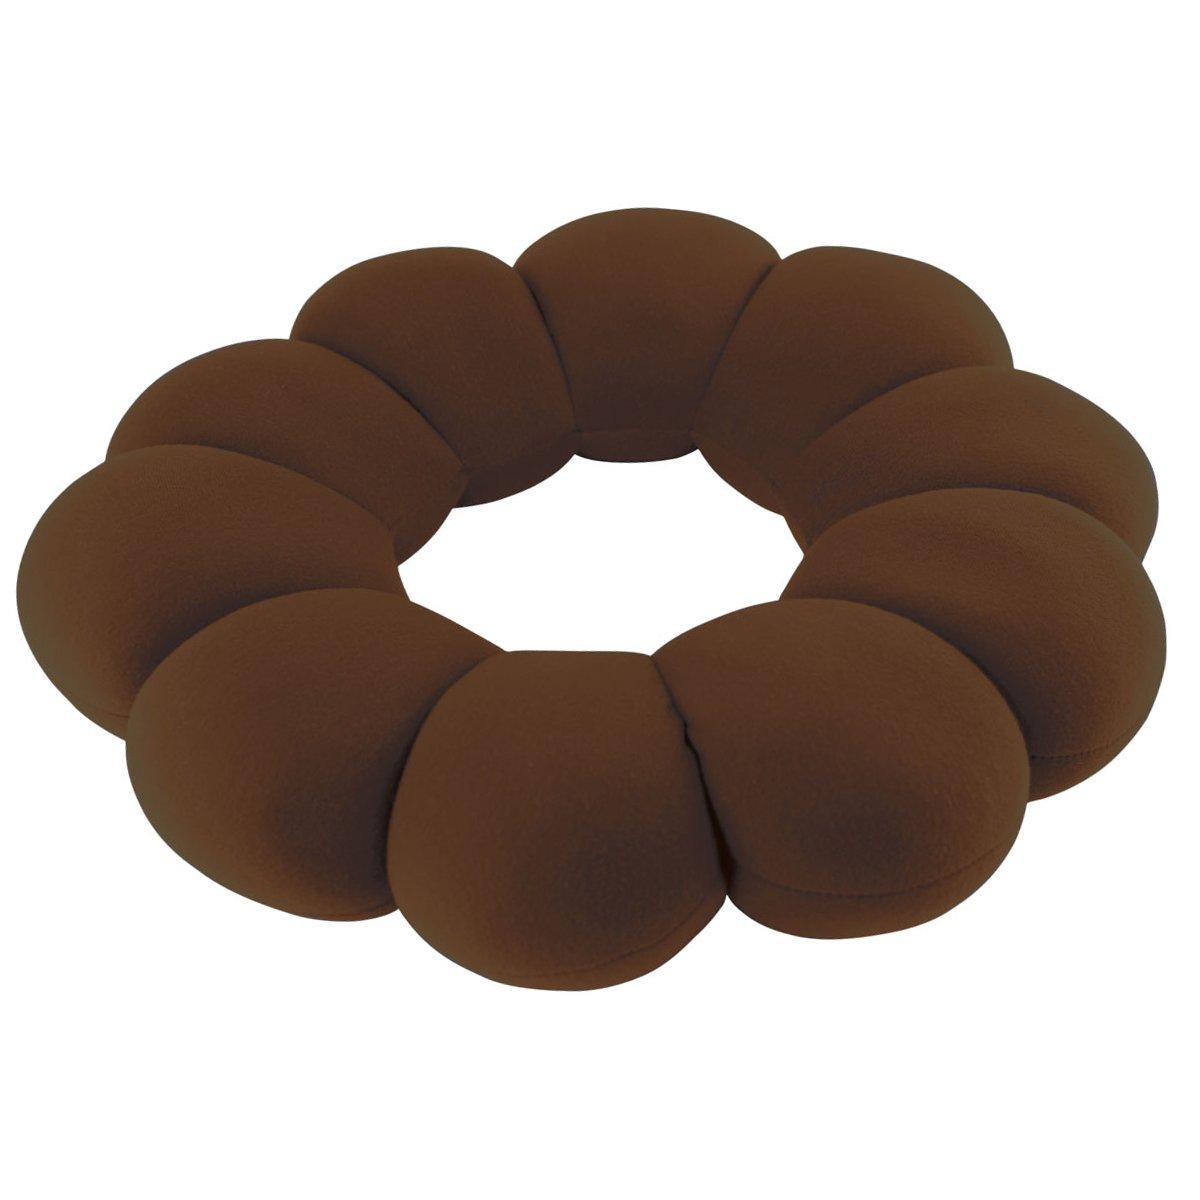 Felicity Hemorrhoid Treatment Donut Travel Pillow Cushion for Hemorrhoids, Prostate Cushion, Pregnancy Cushion (Brown)